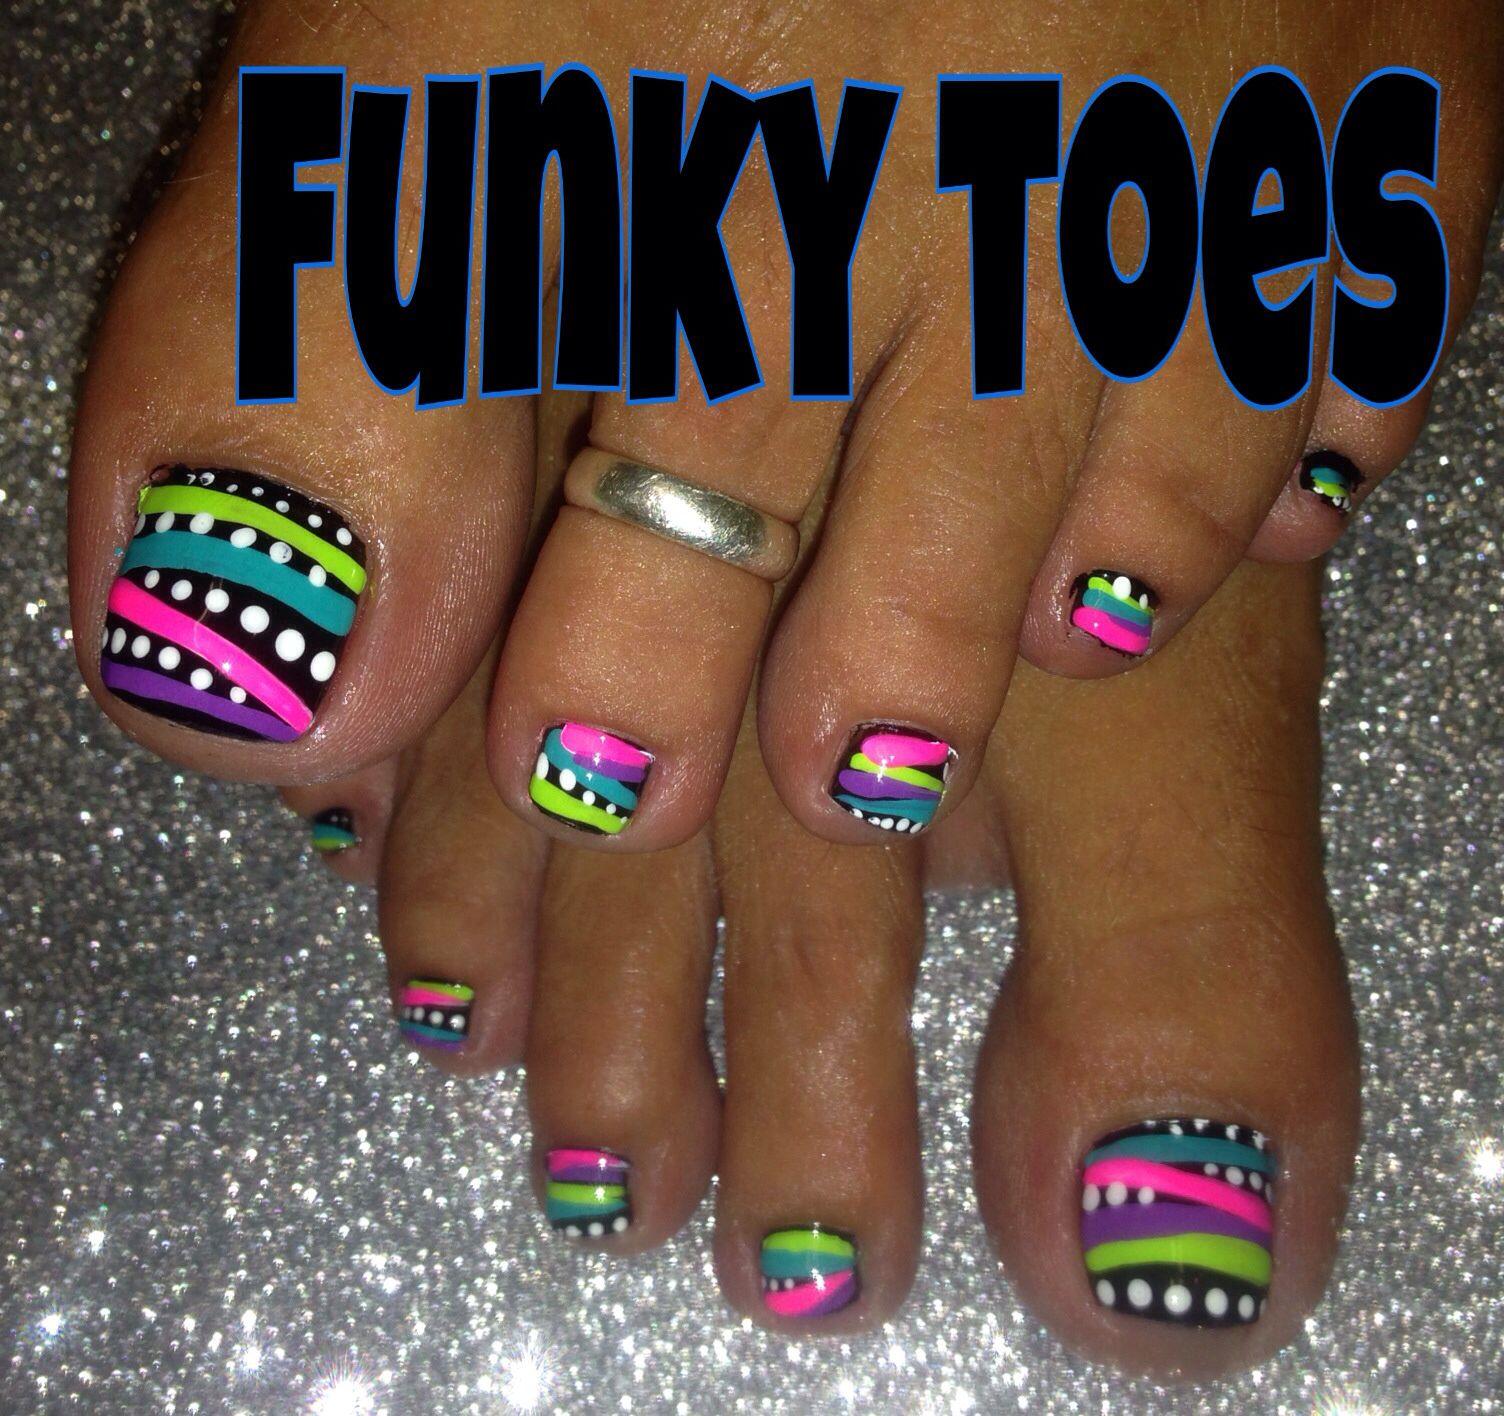 Fun Design For Summer | Lovely Nail Art | Pinterest | Summer, Art ...